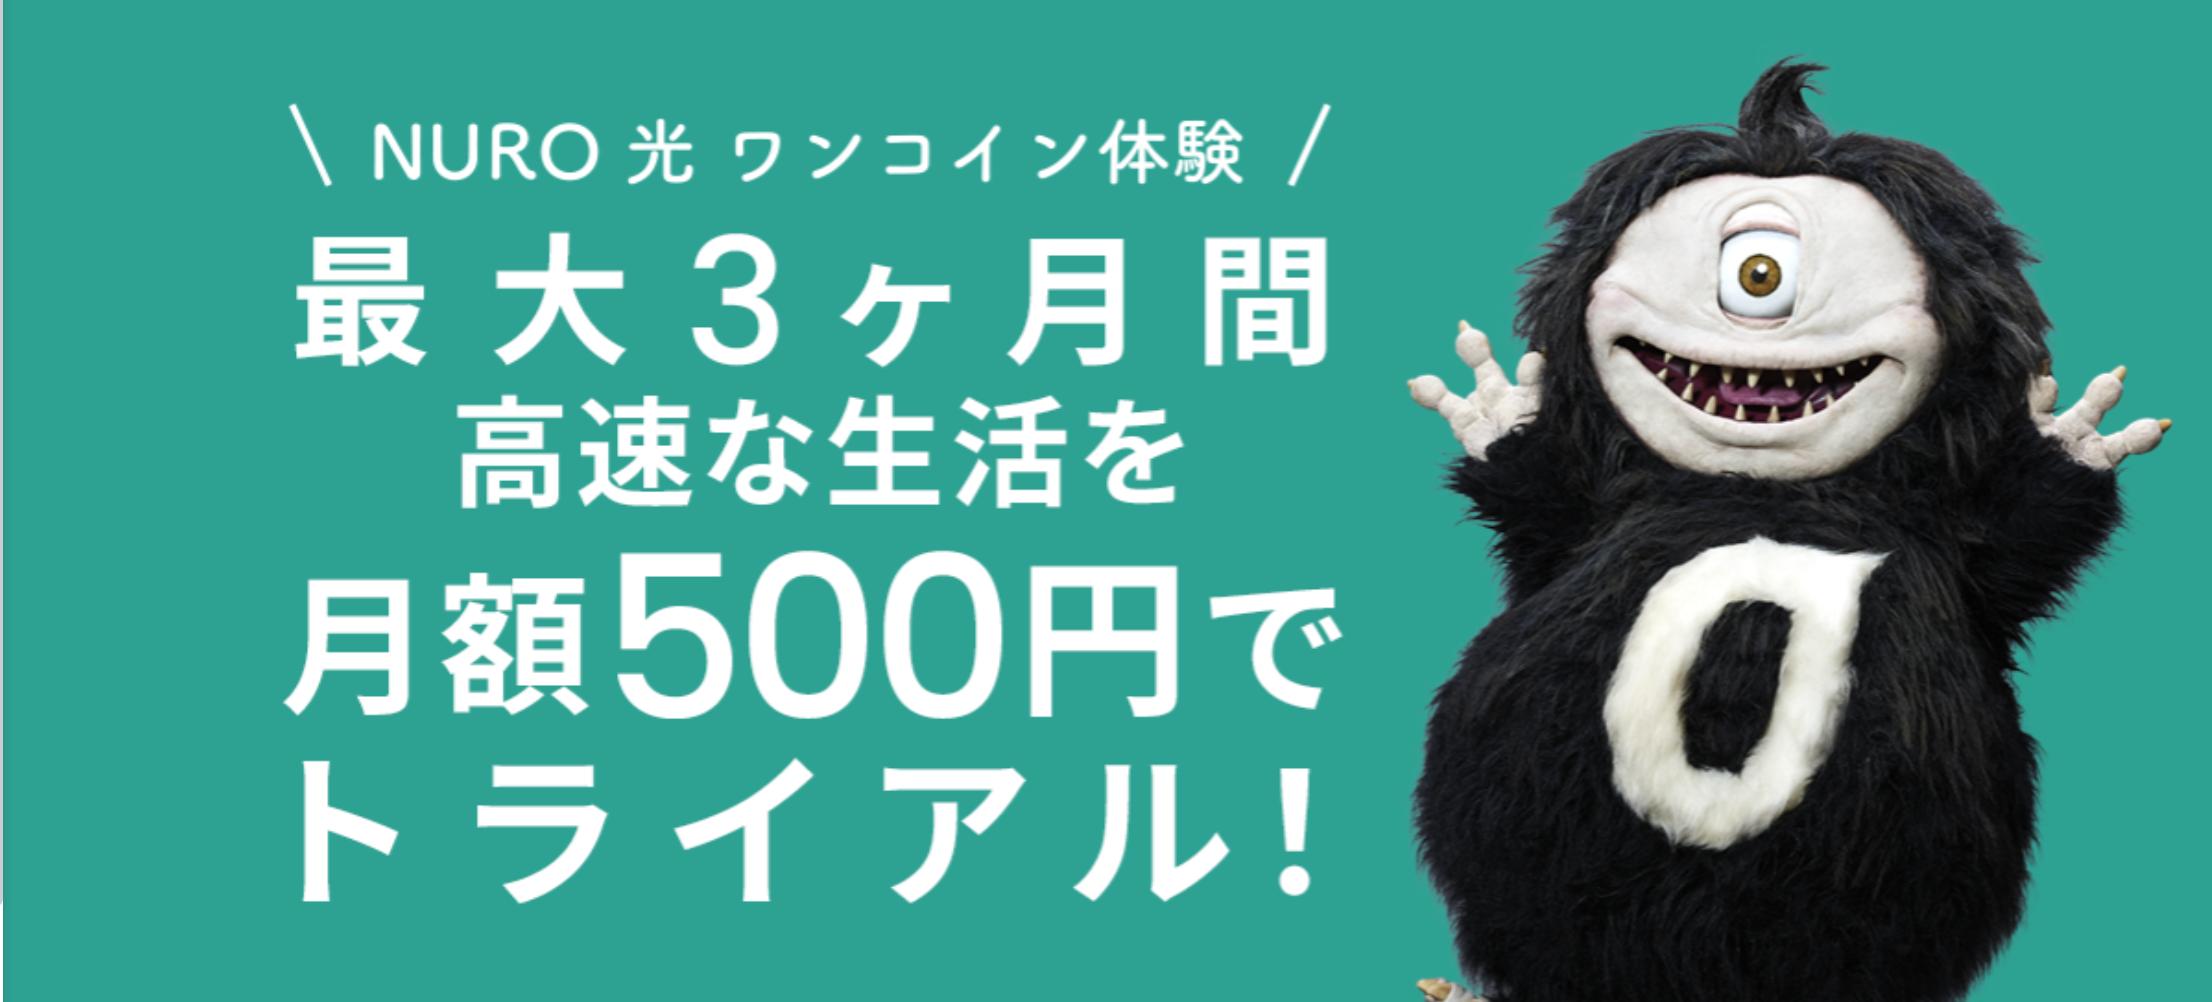 NURO光 キャンペーン 500円